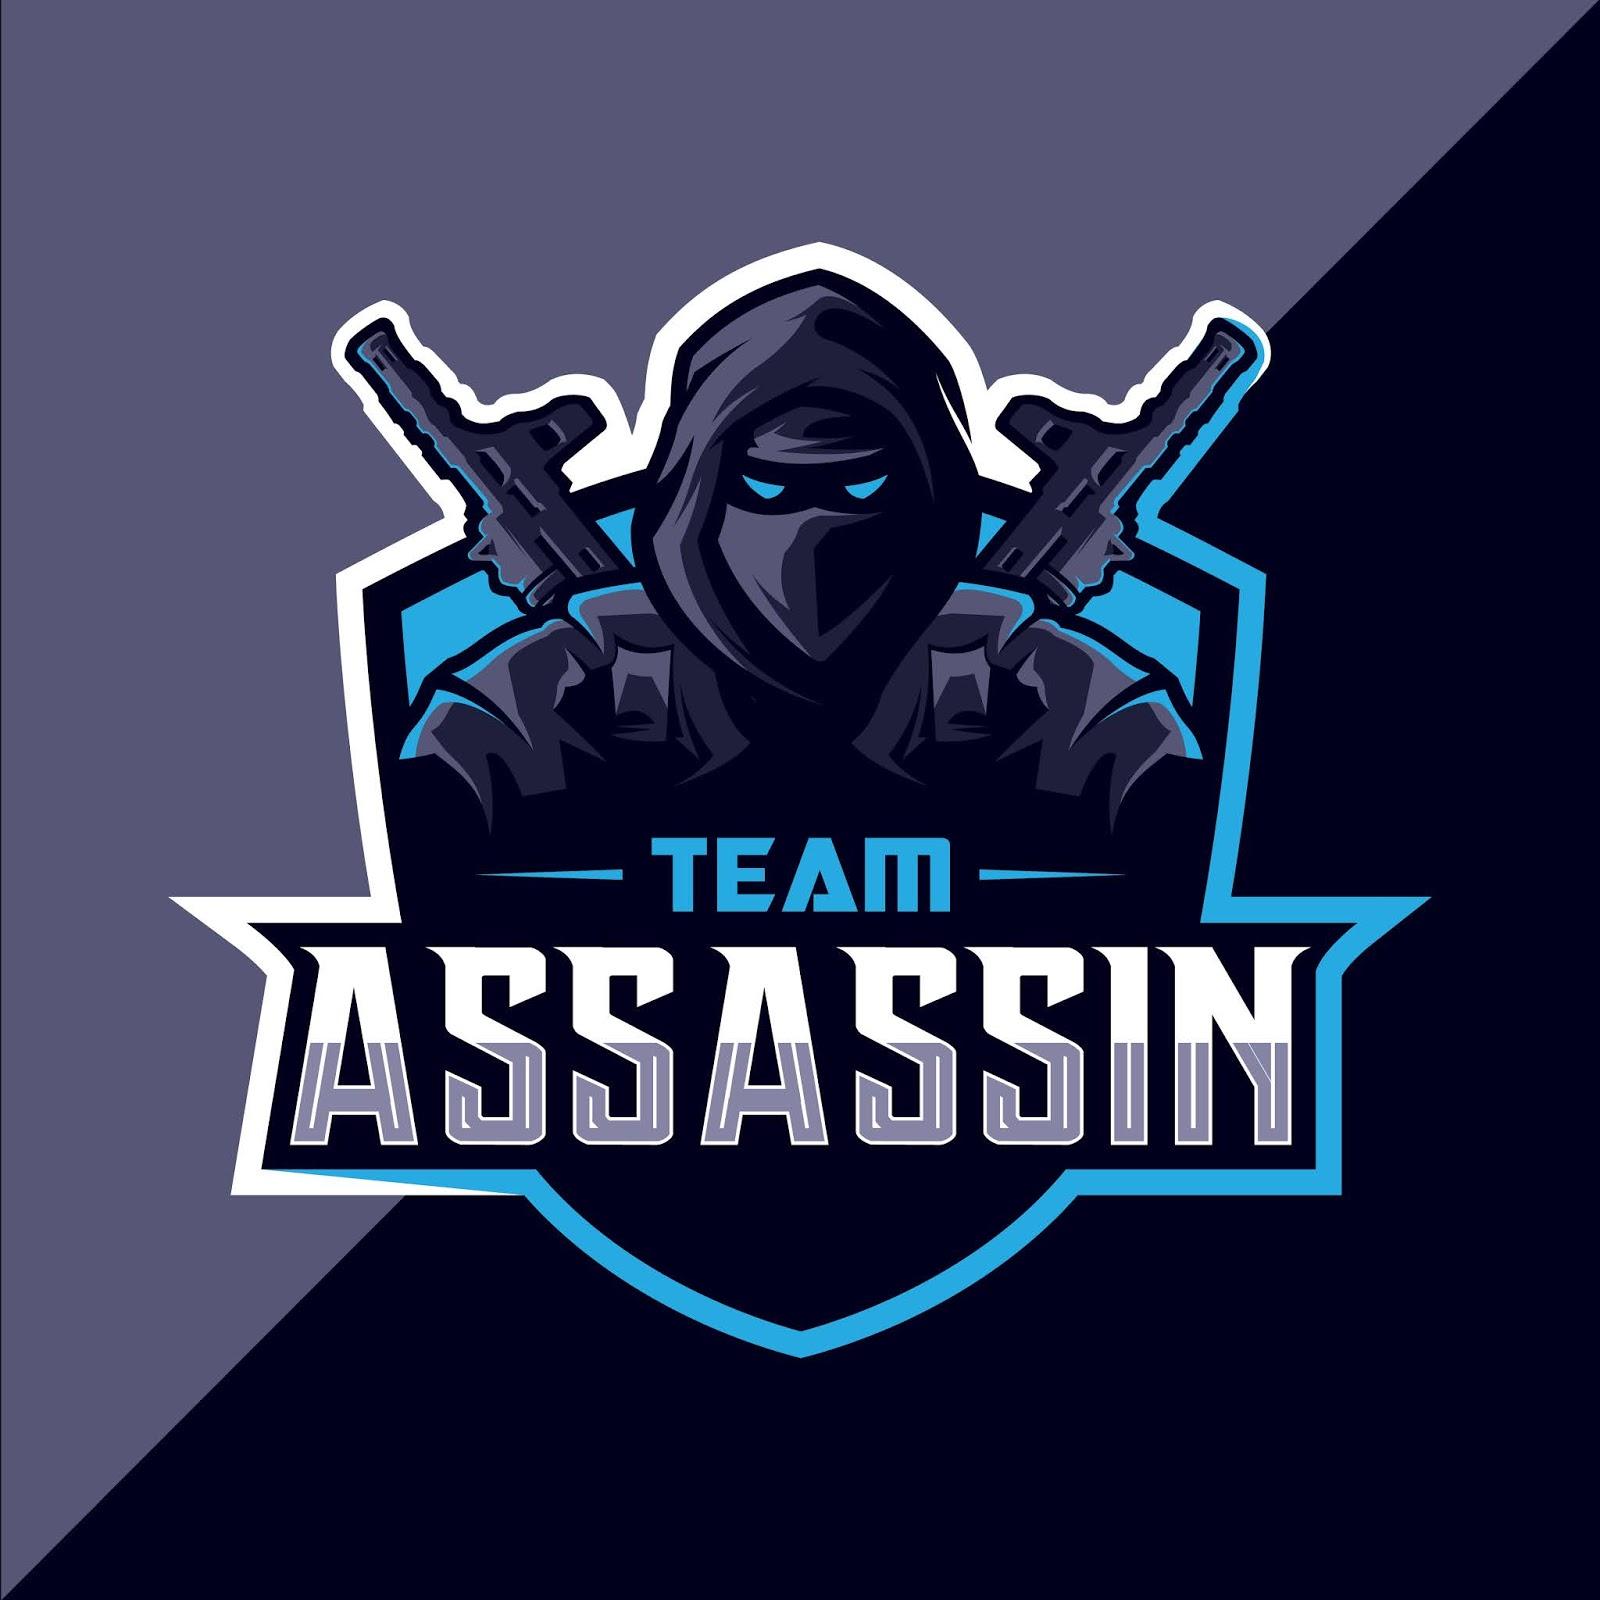 Assassin With Gun Mascot Esport Logo Design Free Download Vector CDR, AI, EPS and PNG Formats